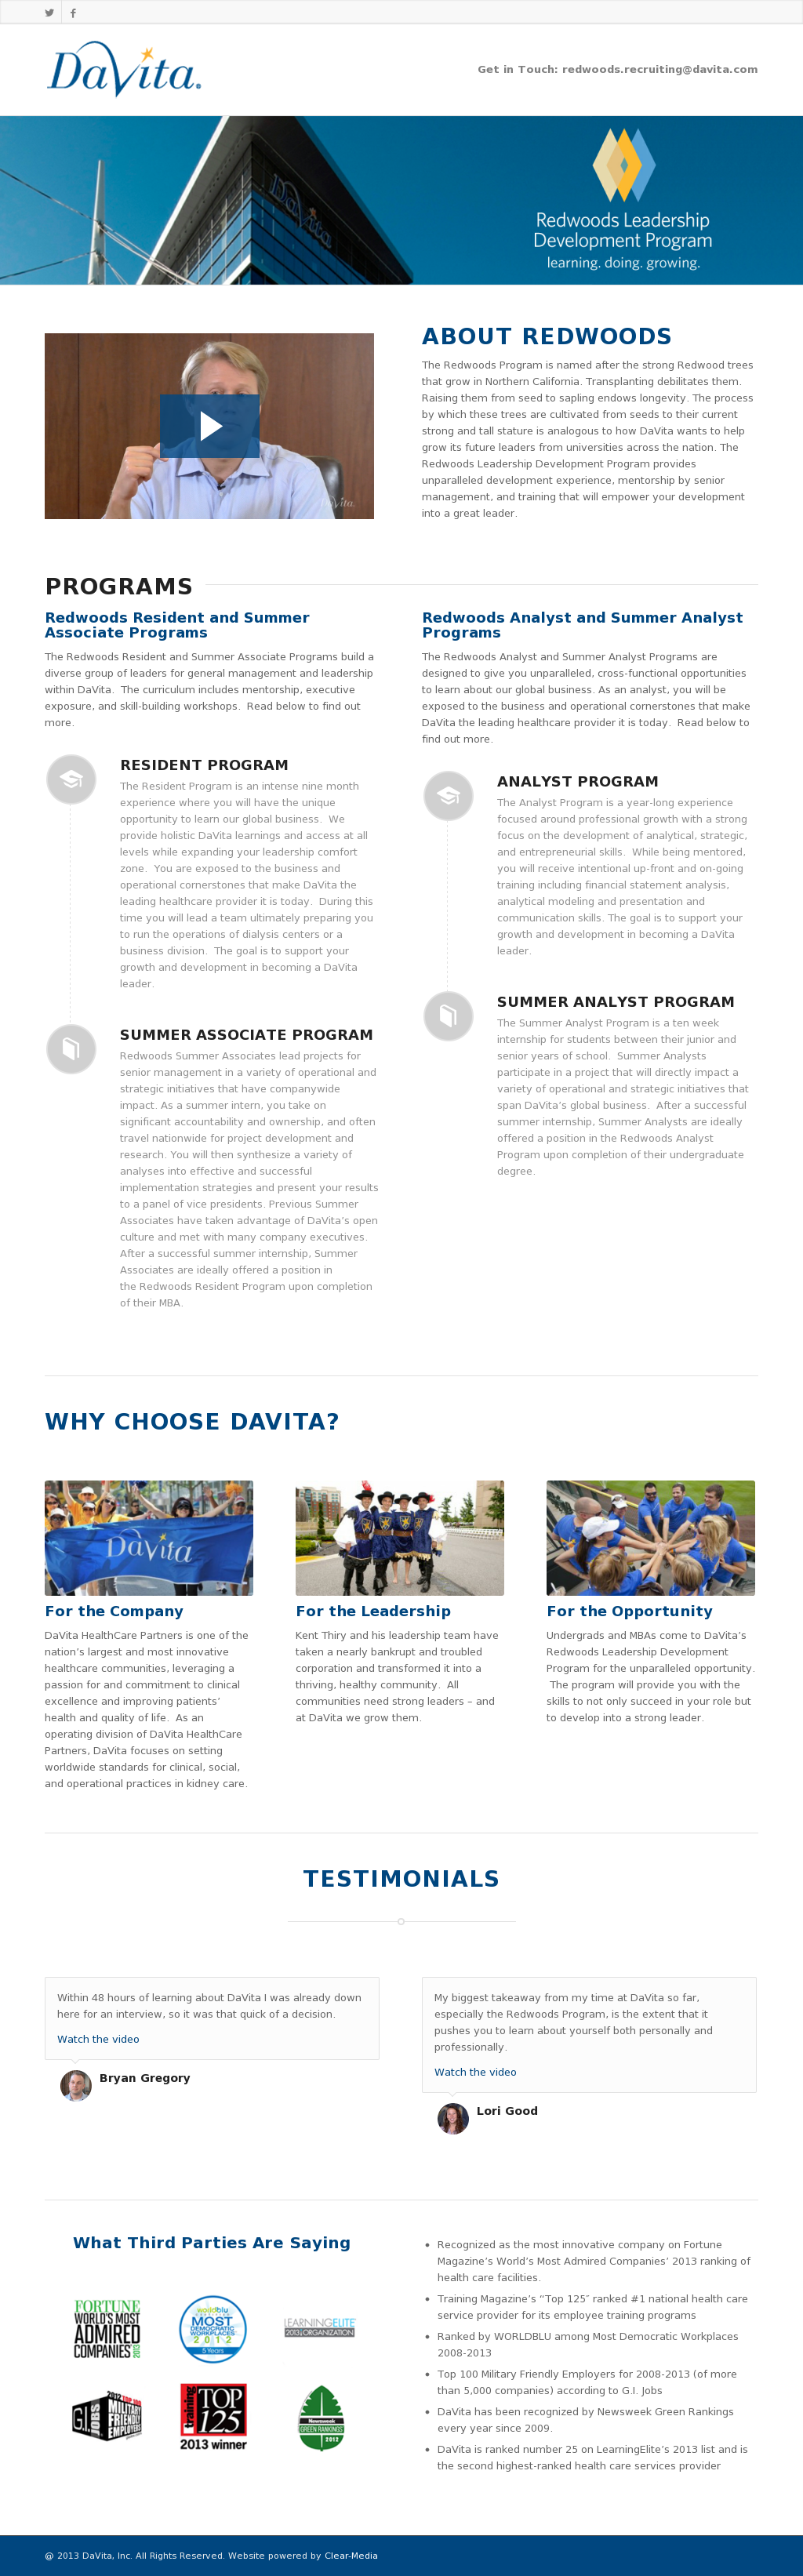 Davita Redwoods Leadership Development Program Competitors